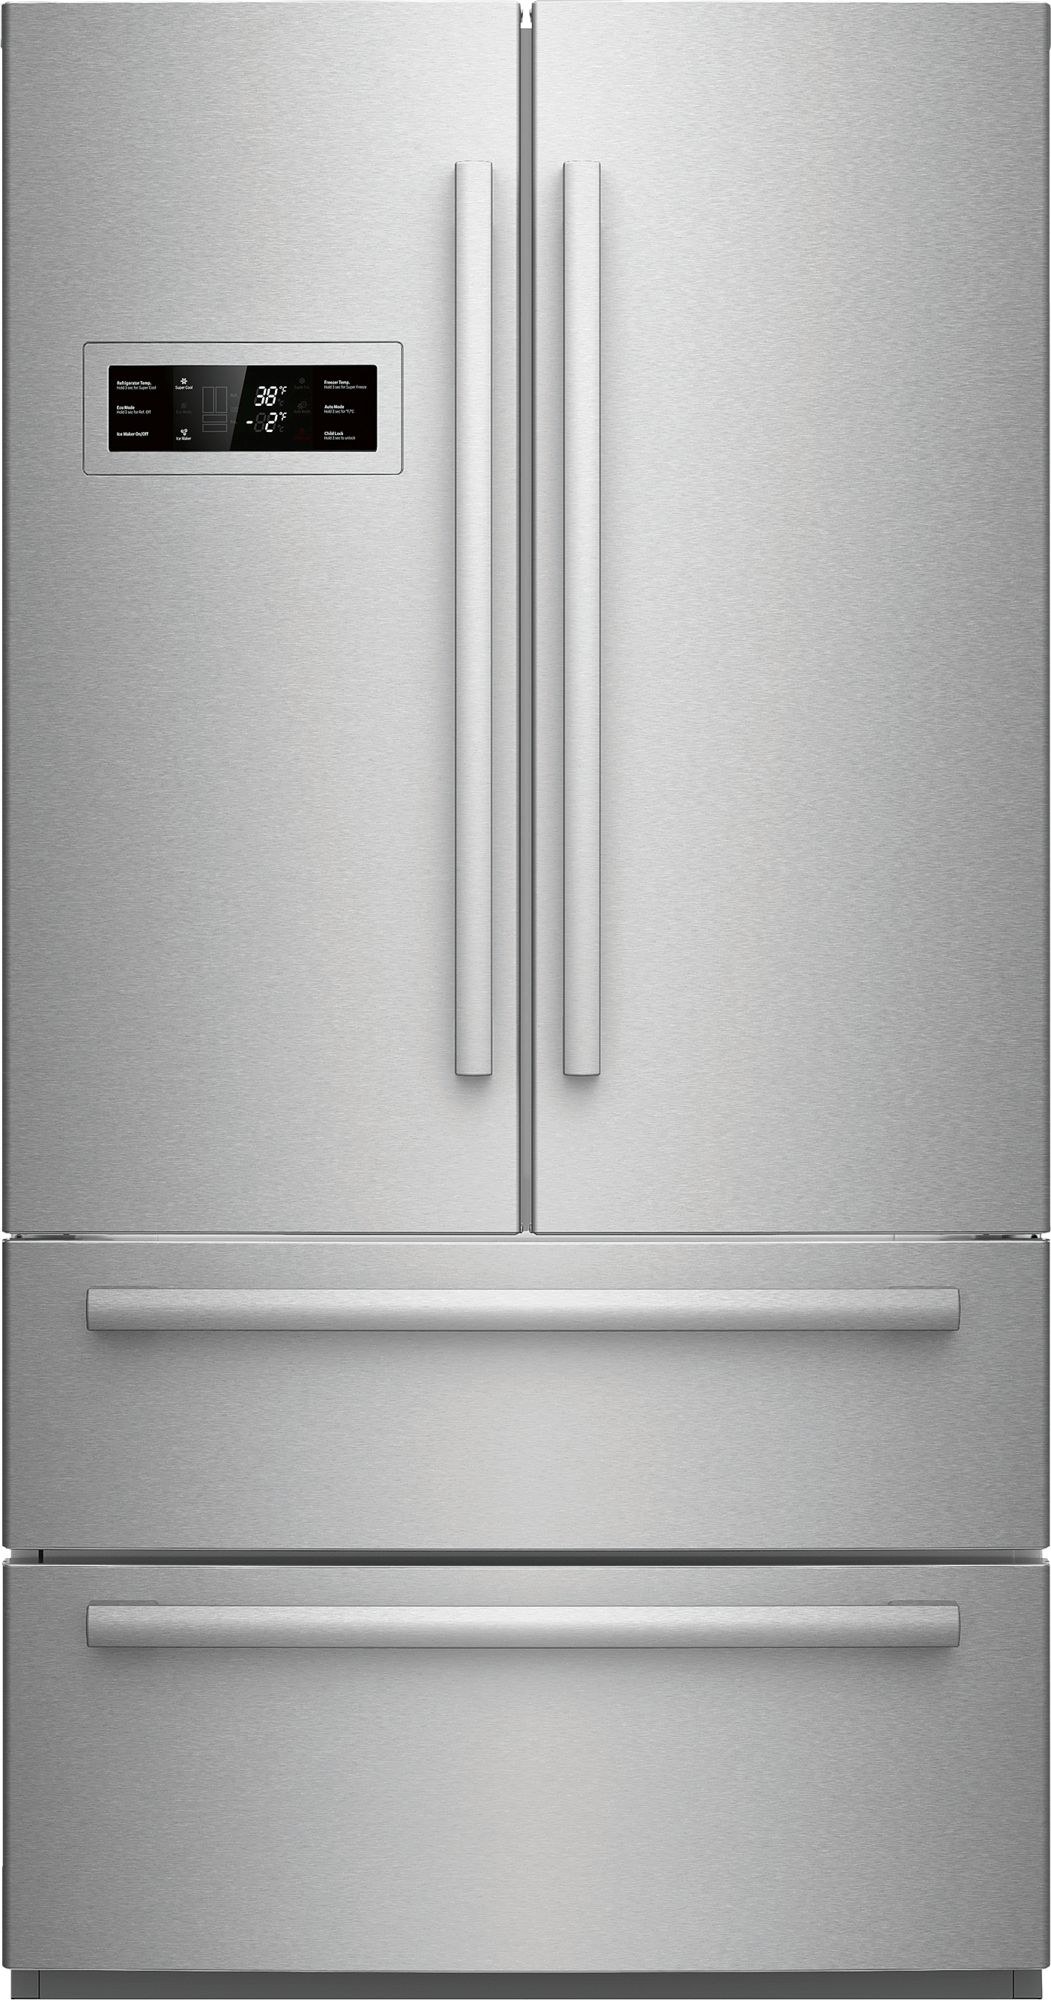 Counter Depth Refrigerator Lenexa Kansas City Ks